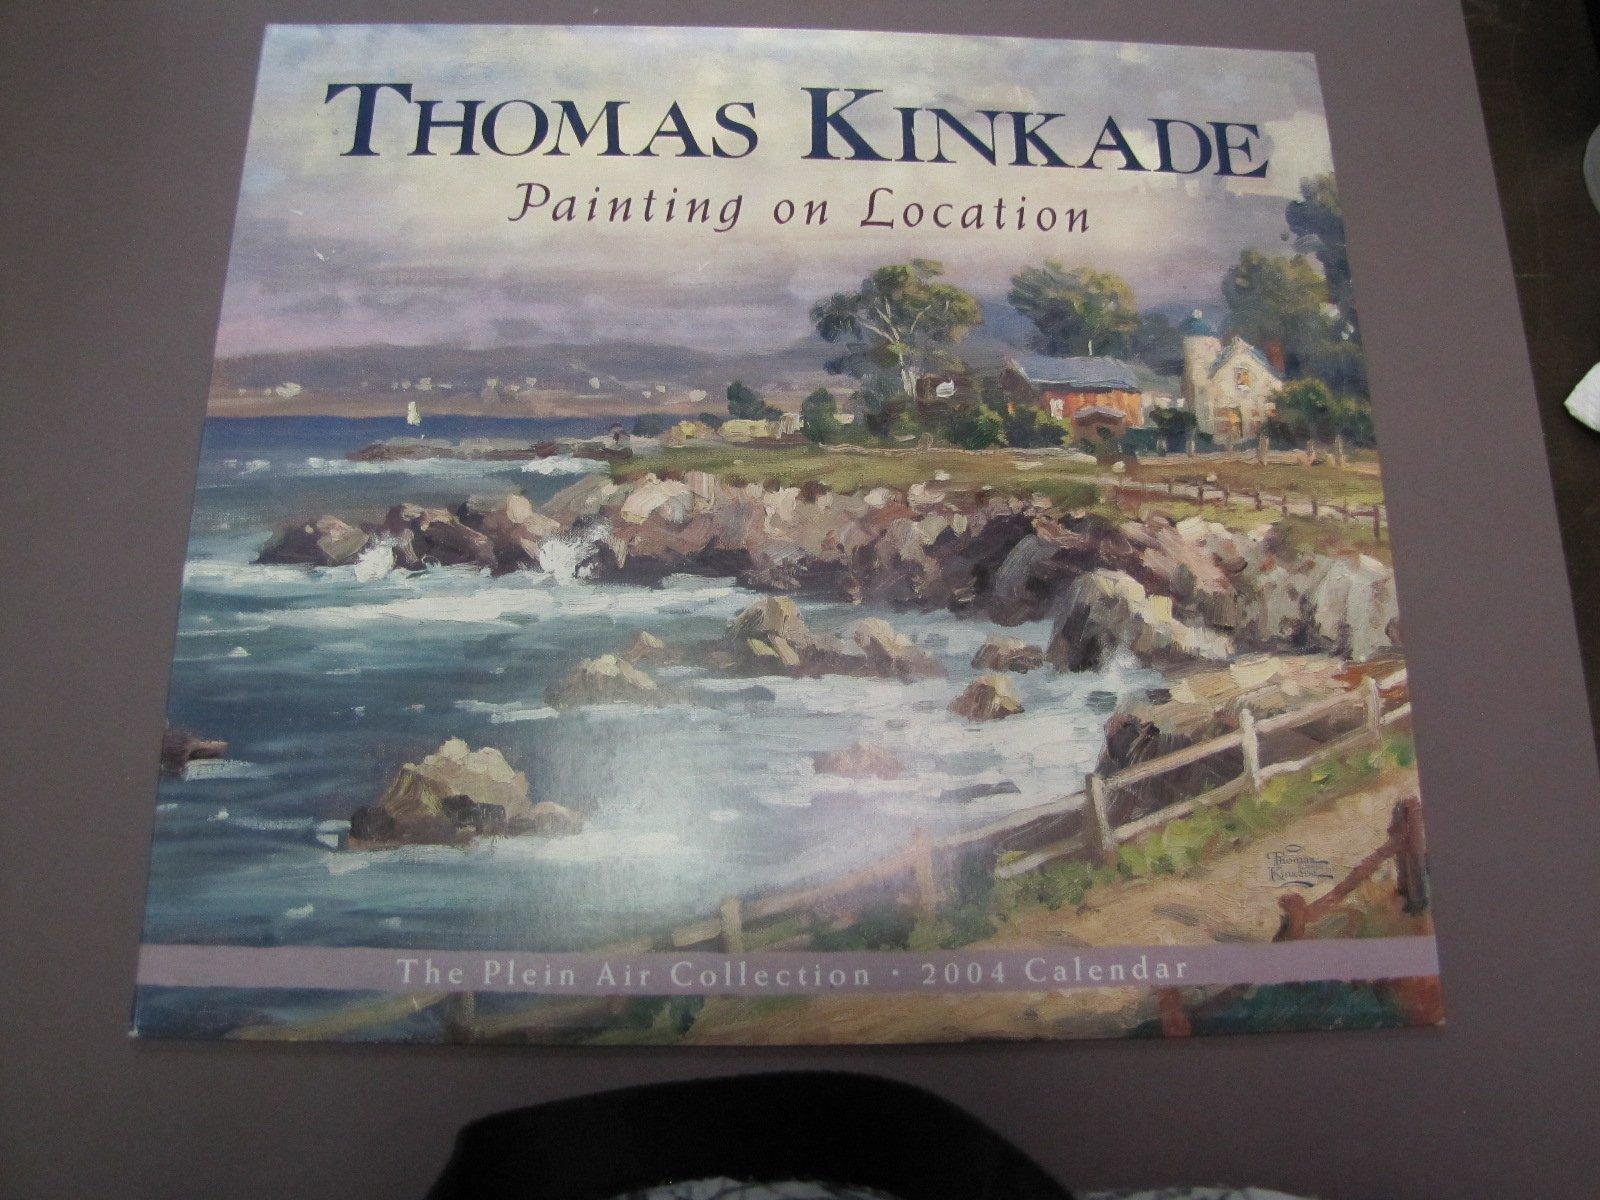 Thomas Kinkade 2004 Calendar Painting On Location The Plein Air Collection ebook